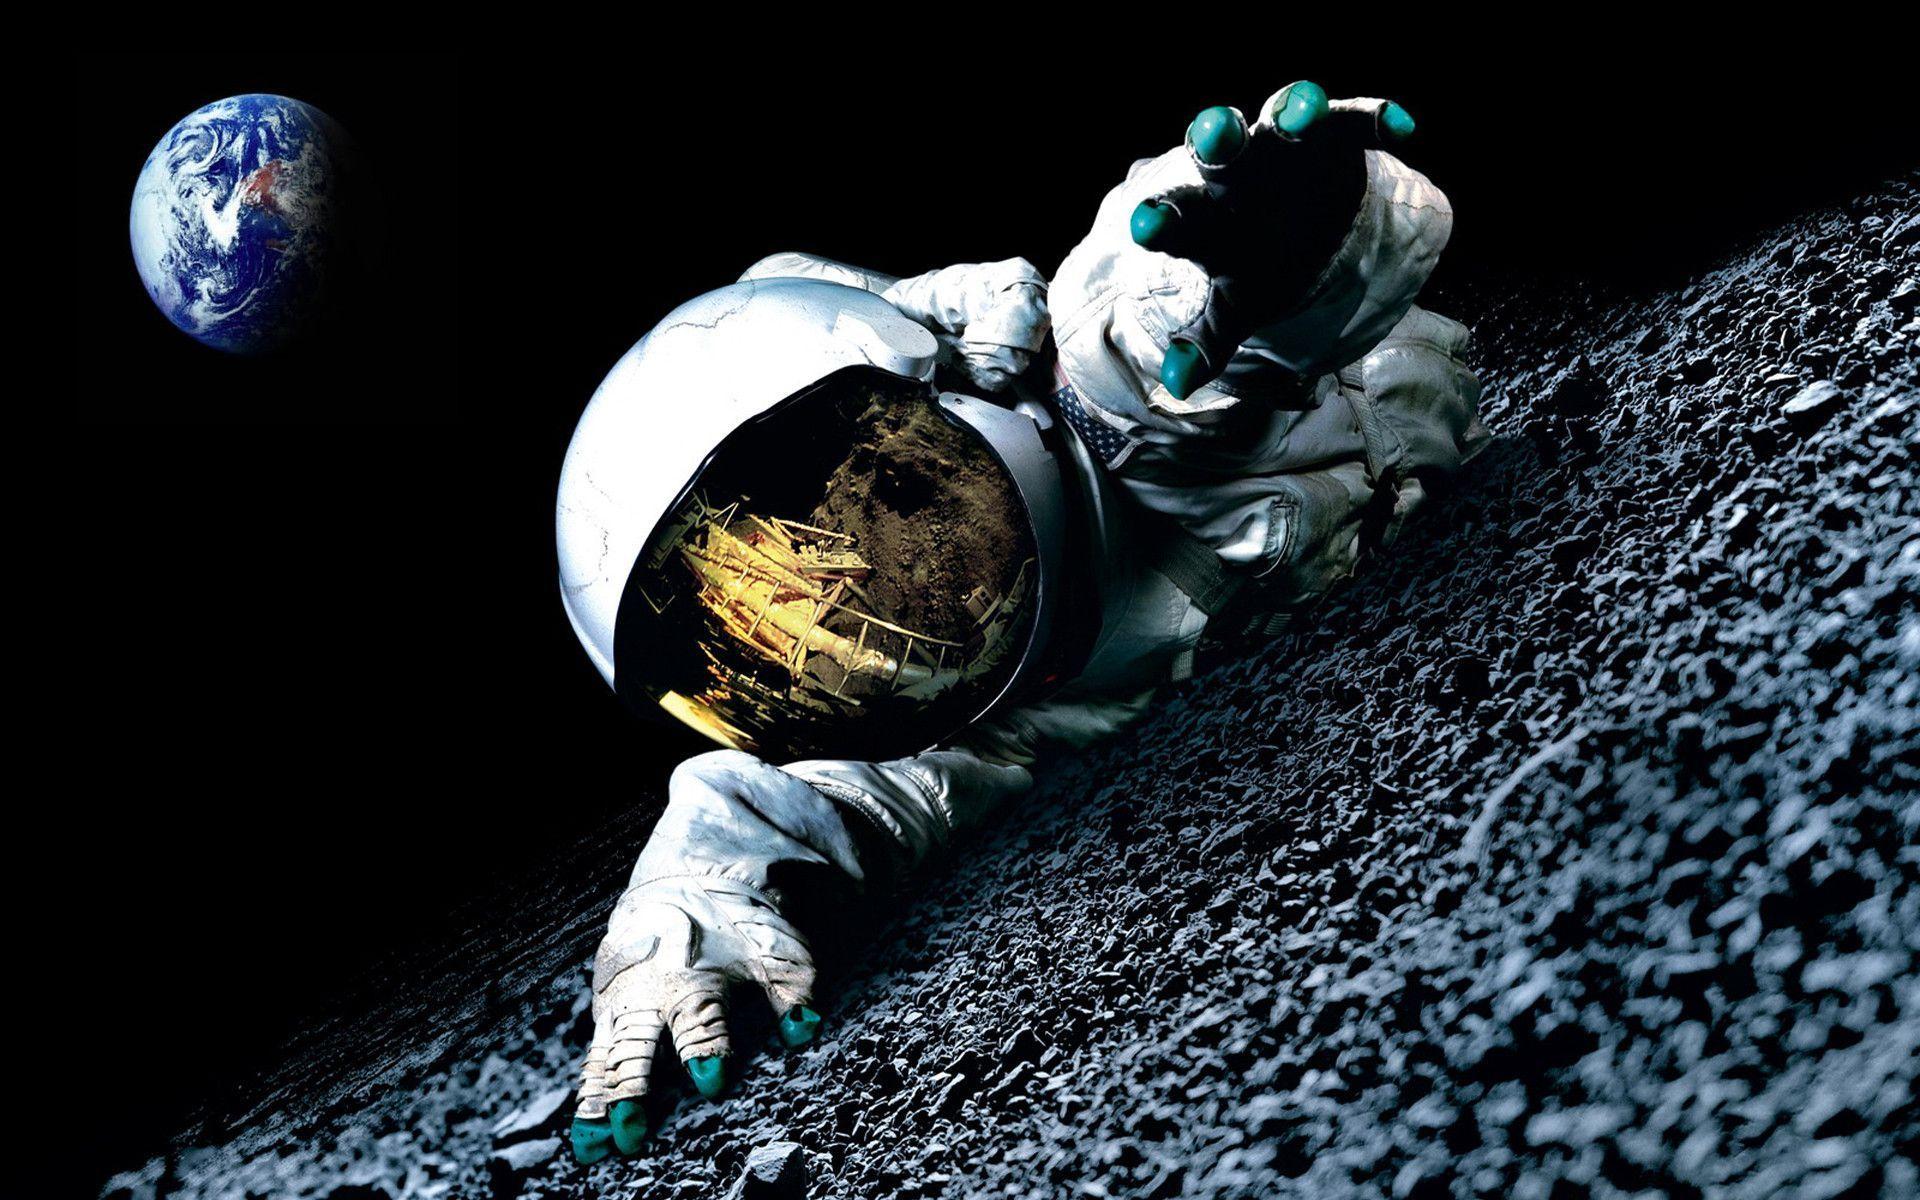 93 Astronaut Wallpapers , HD Wallpaper & Backgrounds